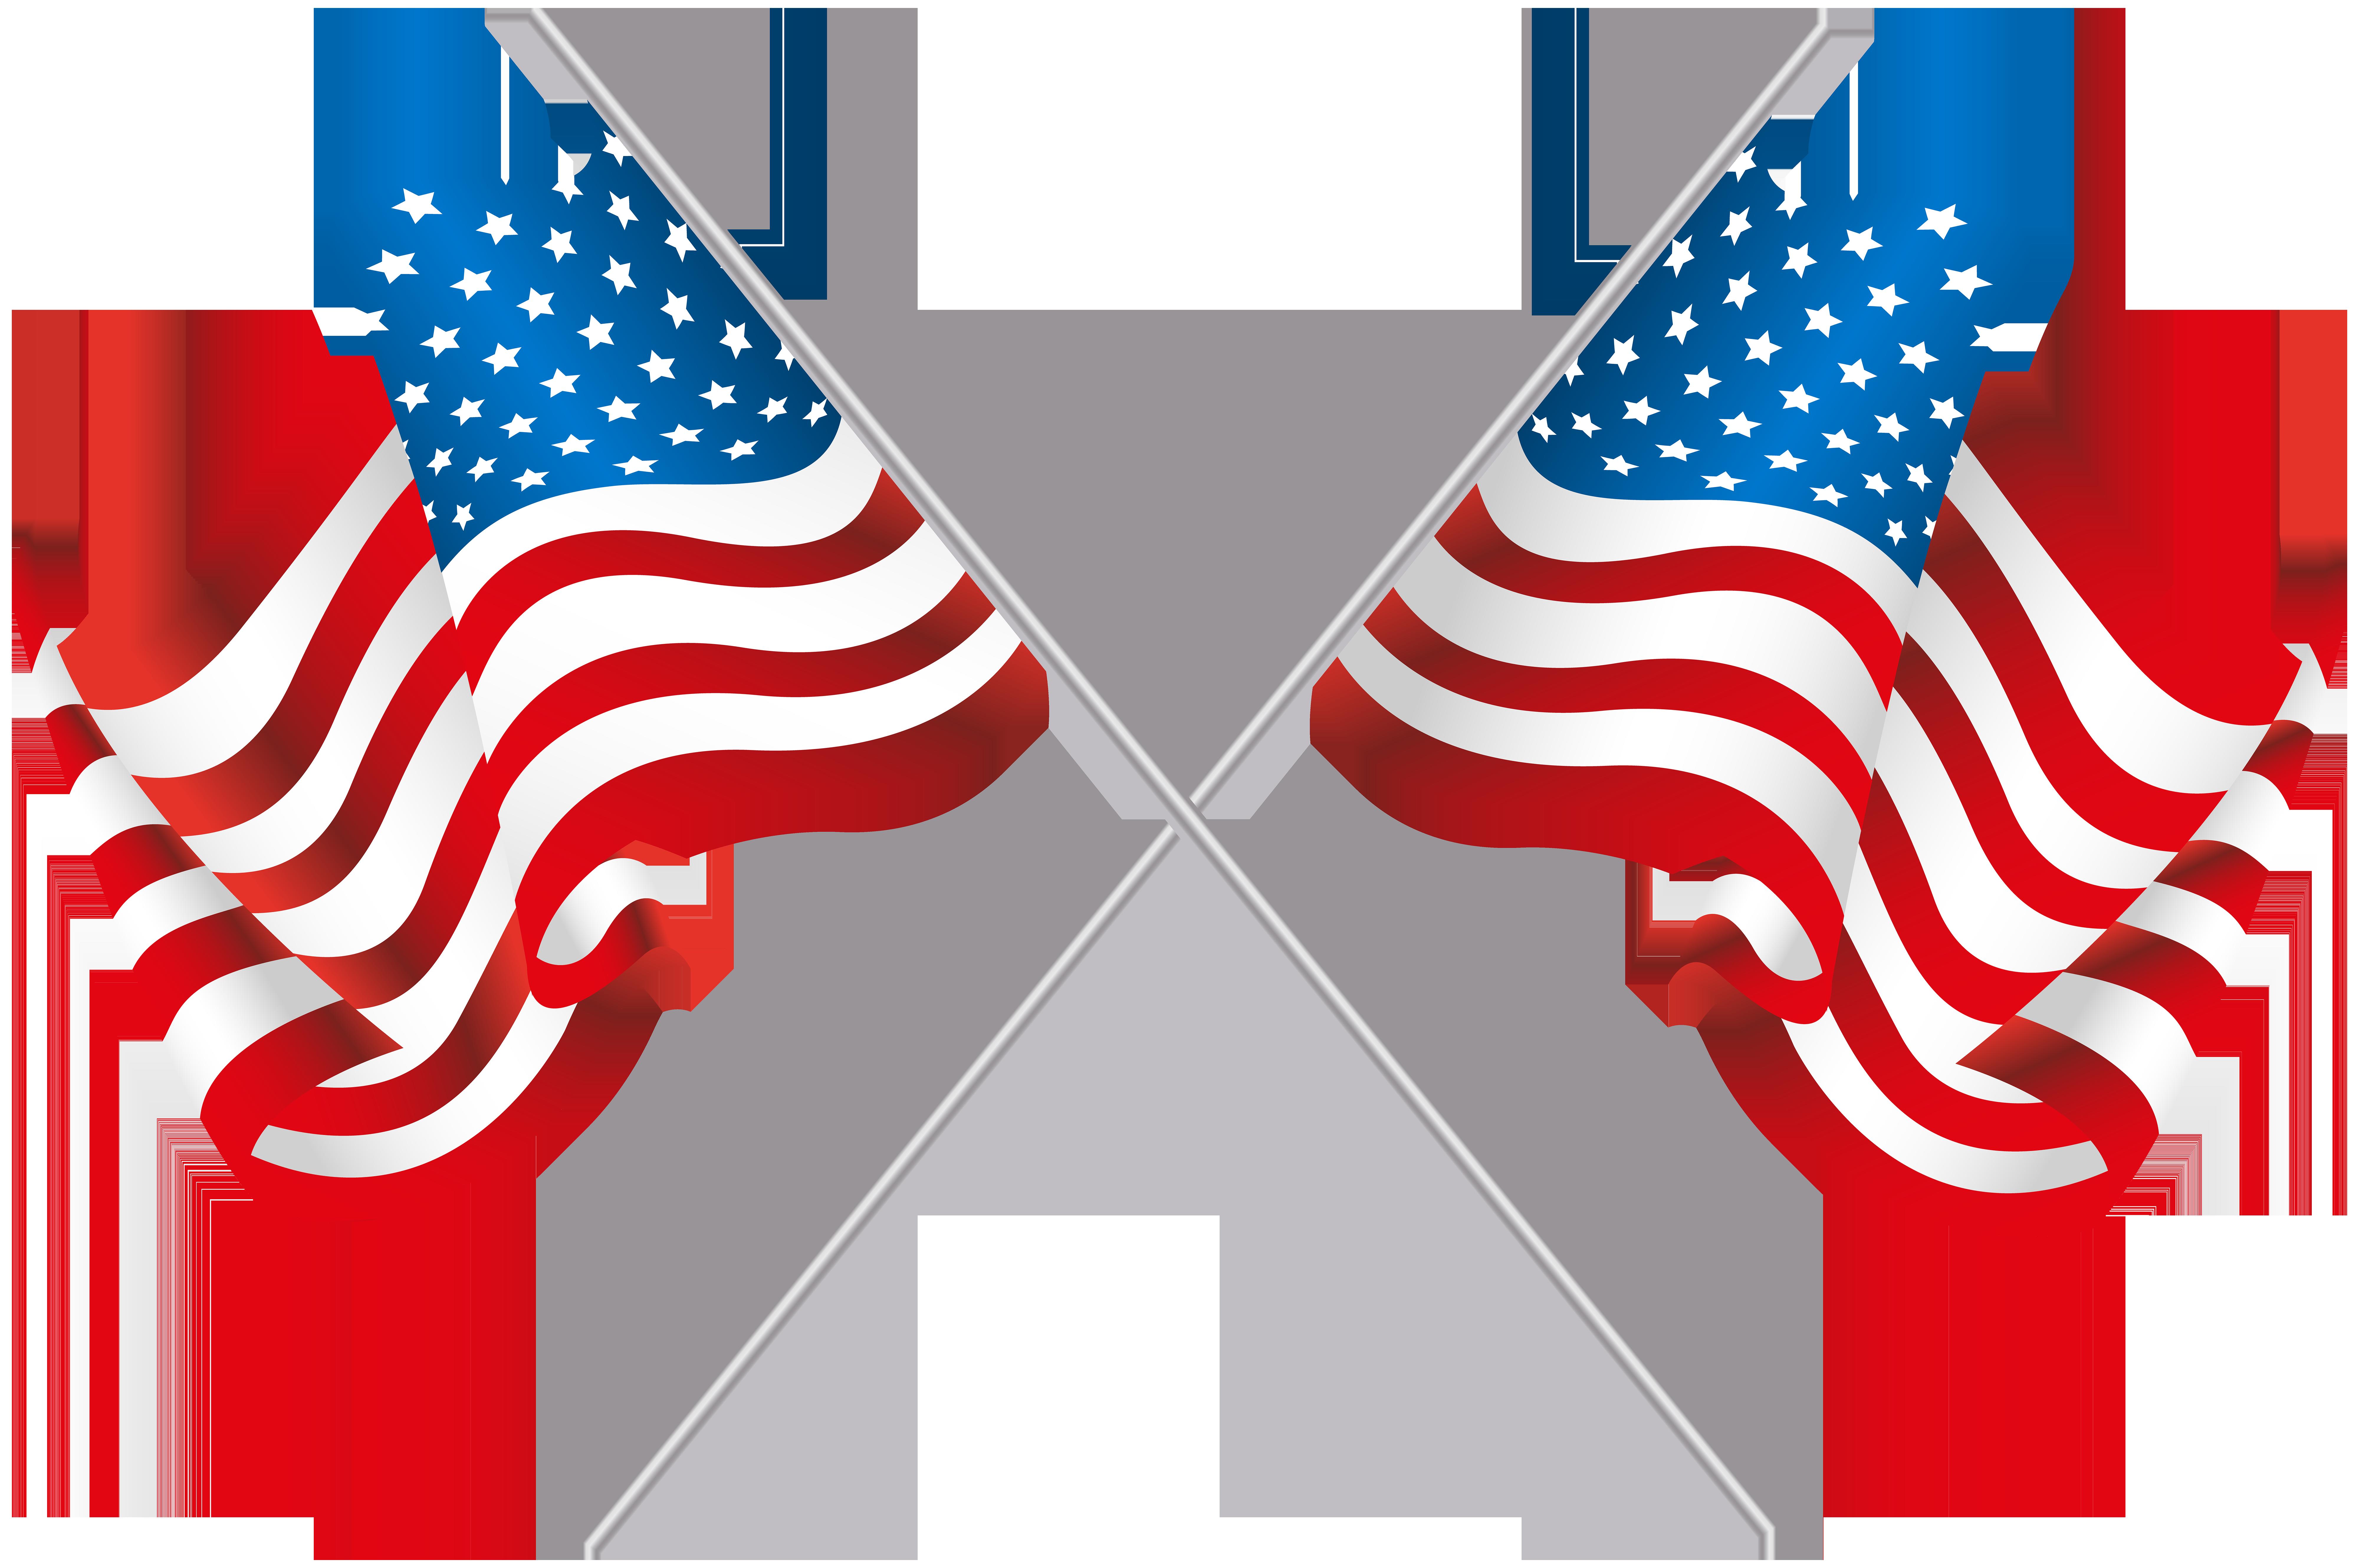 American flag fireworks clipart jpg freeuse Fireworks clipart american flag, Fireworks american flag Transparent ... jpg freeuse